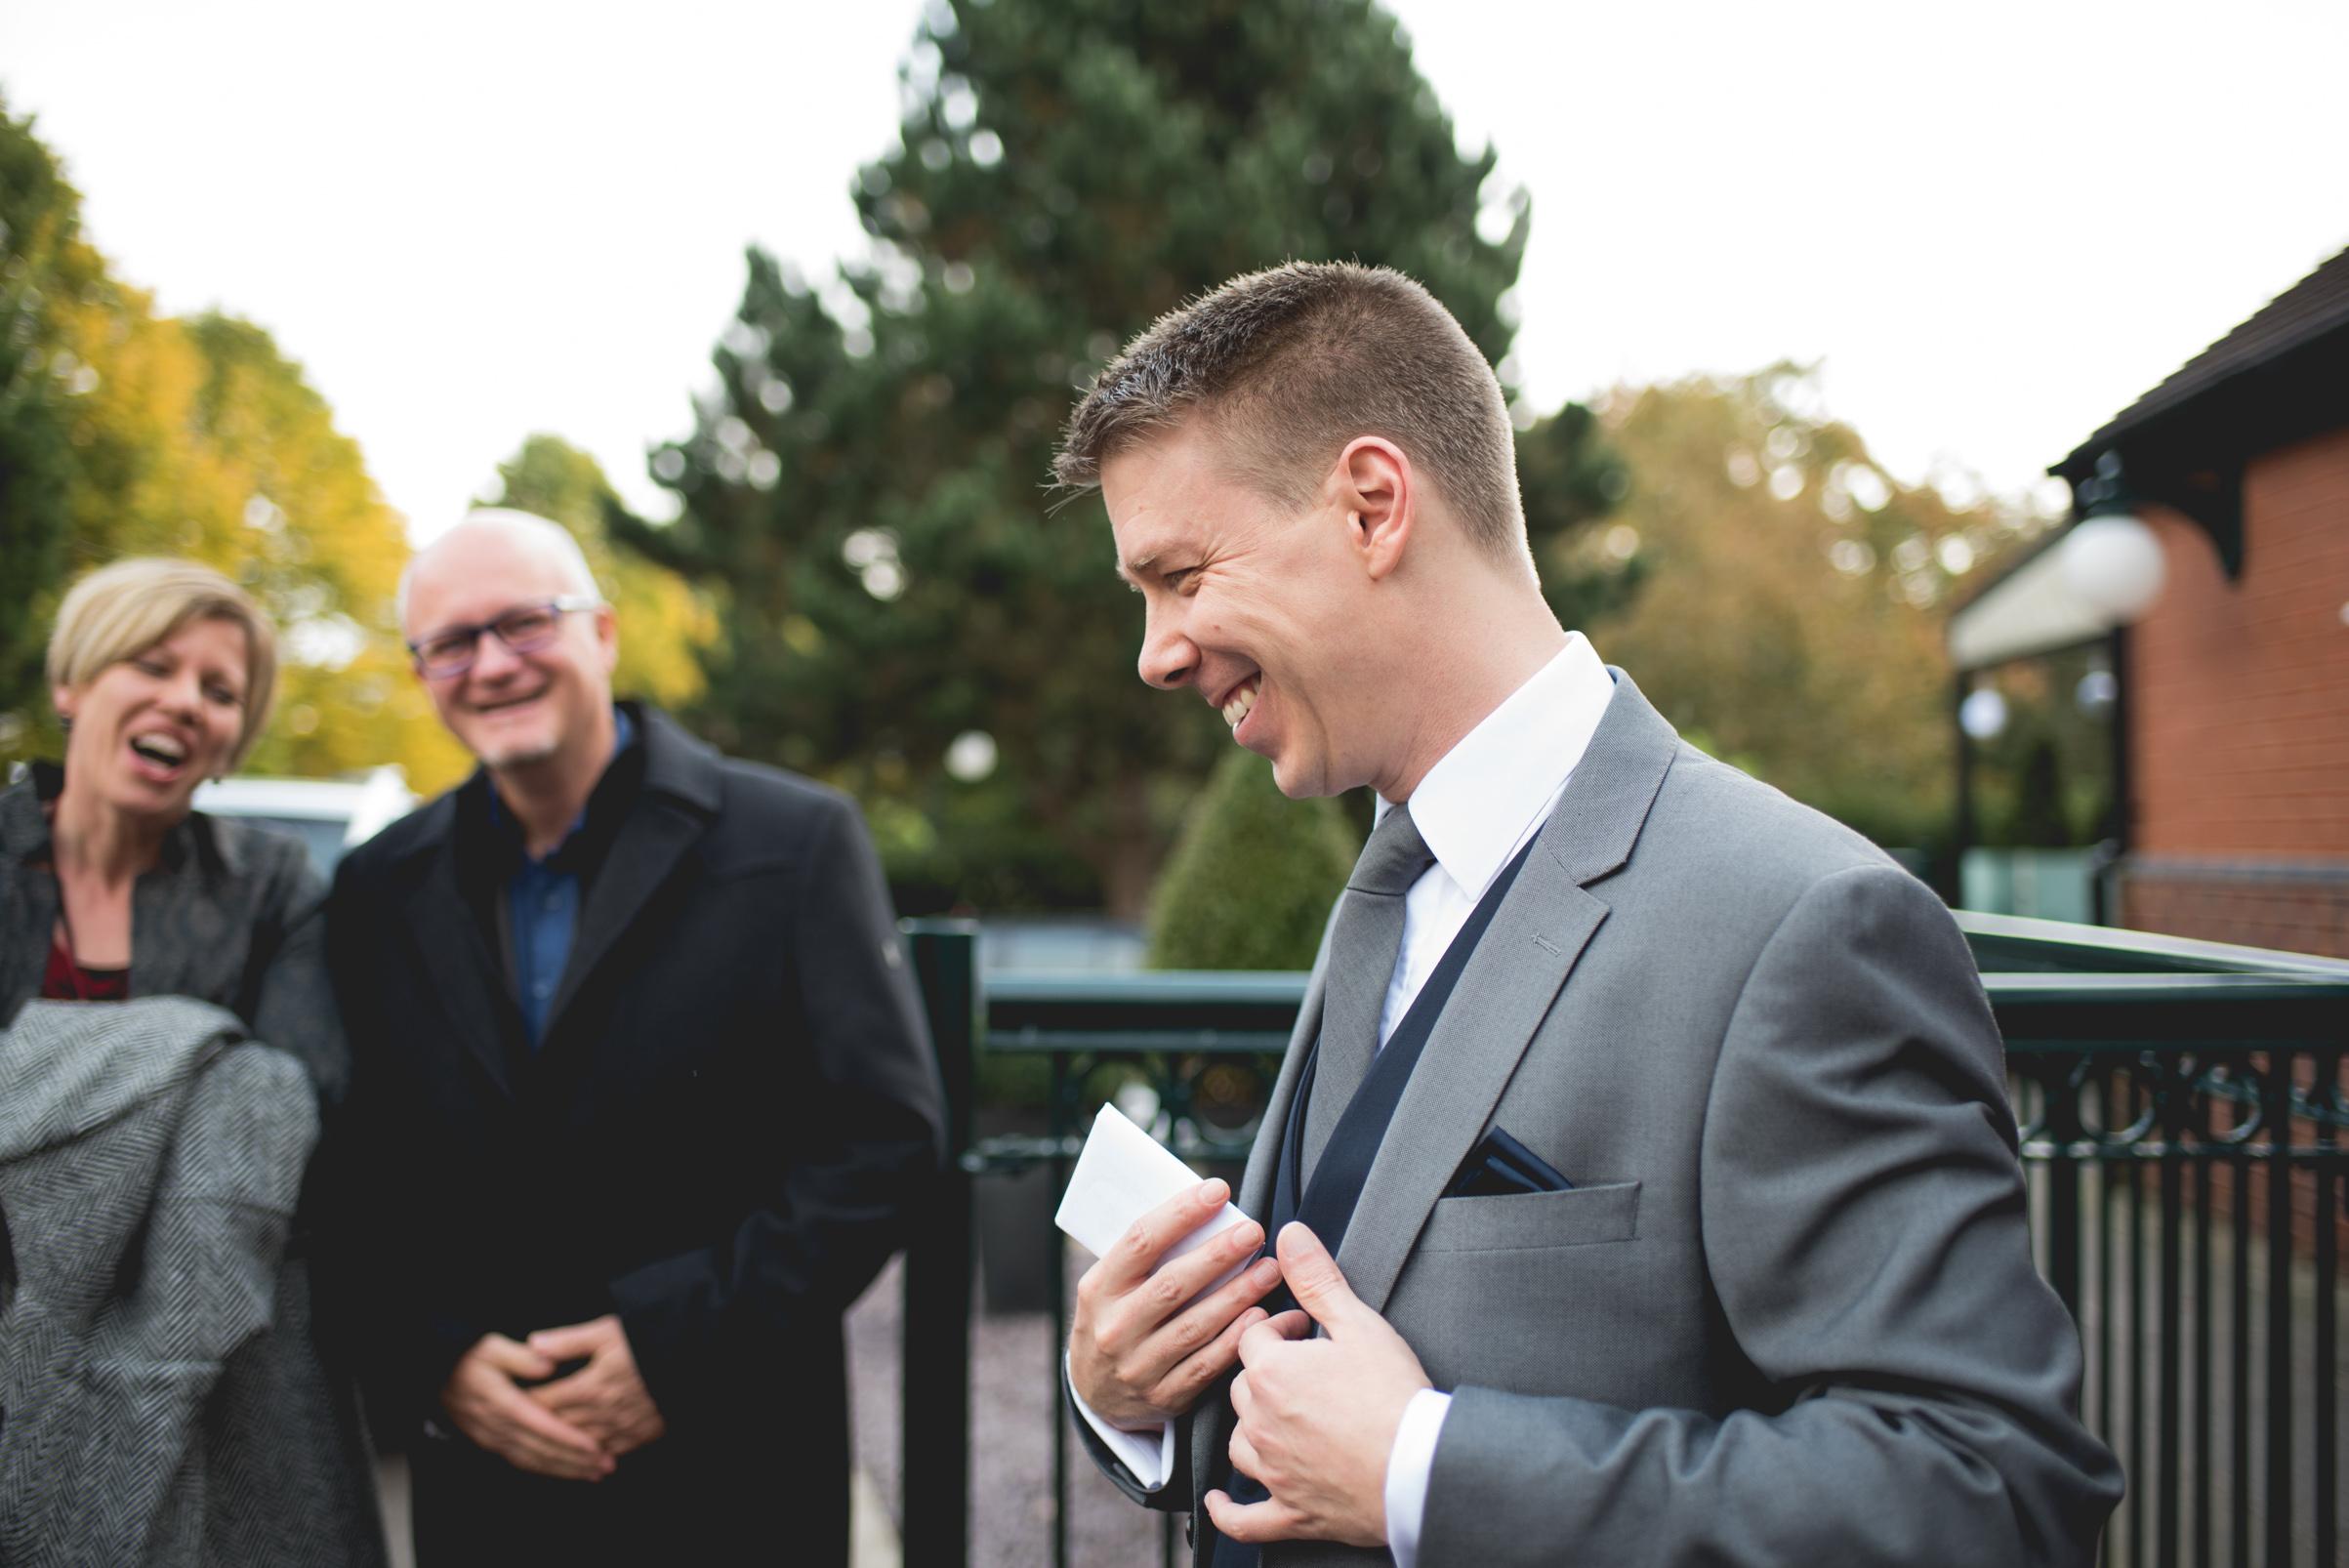 The+Fairlawns+wedding+Aldridge+StLukes+Church-54.jpg